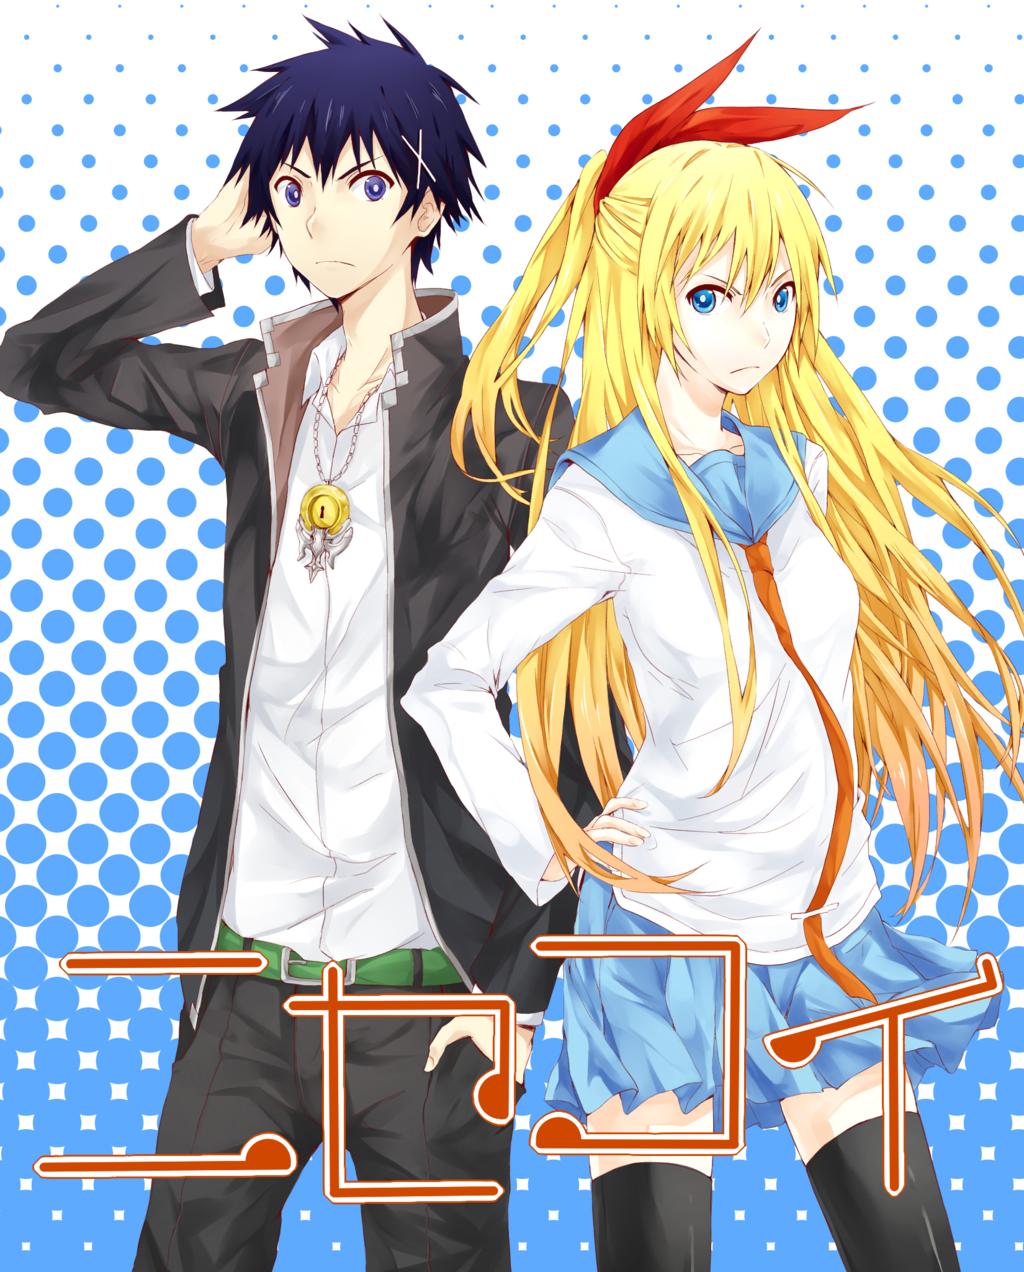 Tag teamchitoge sur Manga-Fan 594264nisekoibyutachibanad71zihk